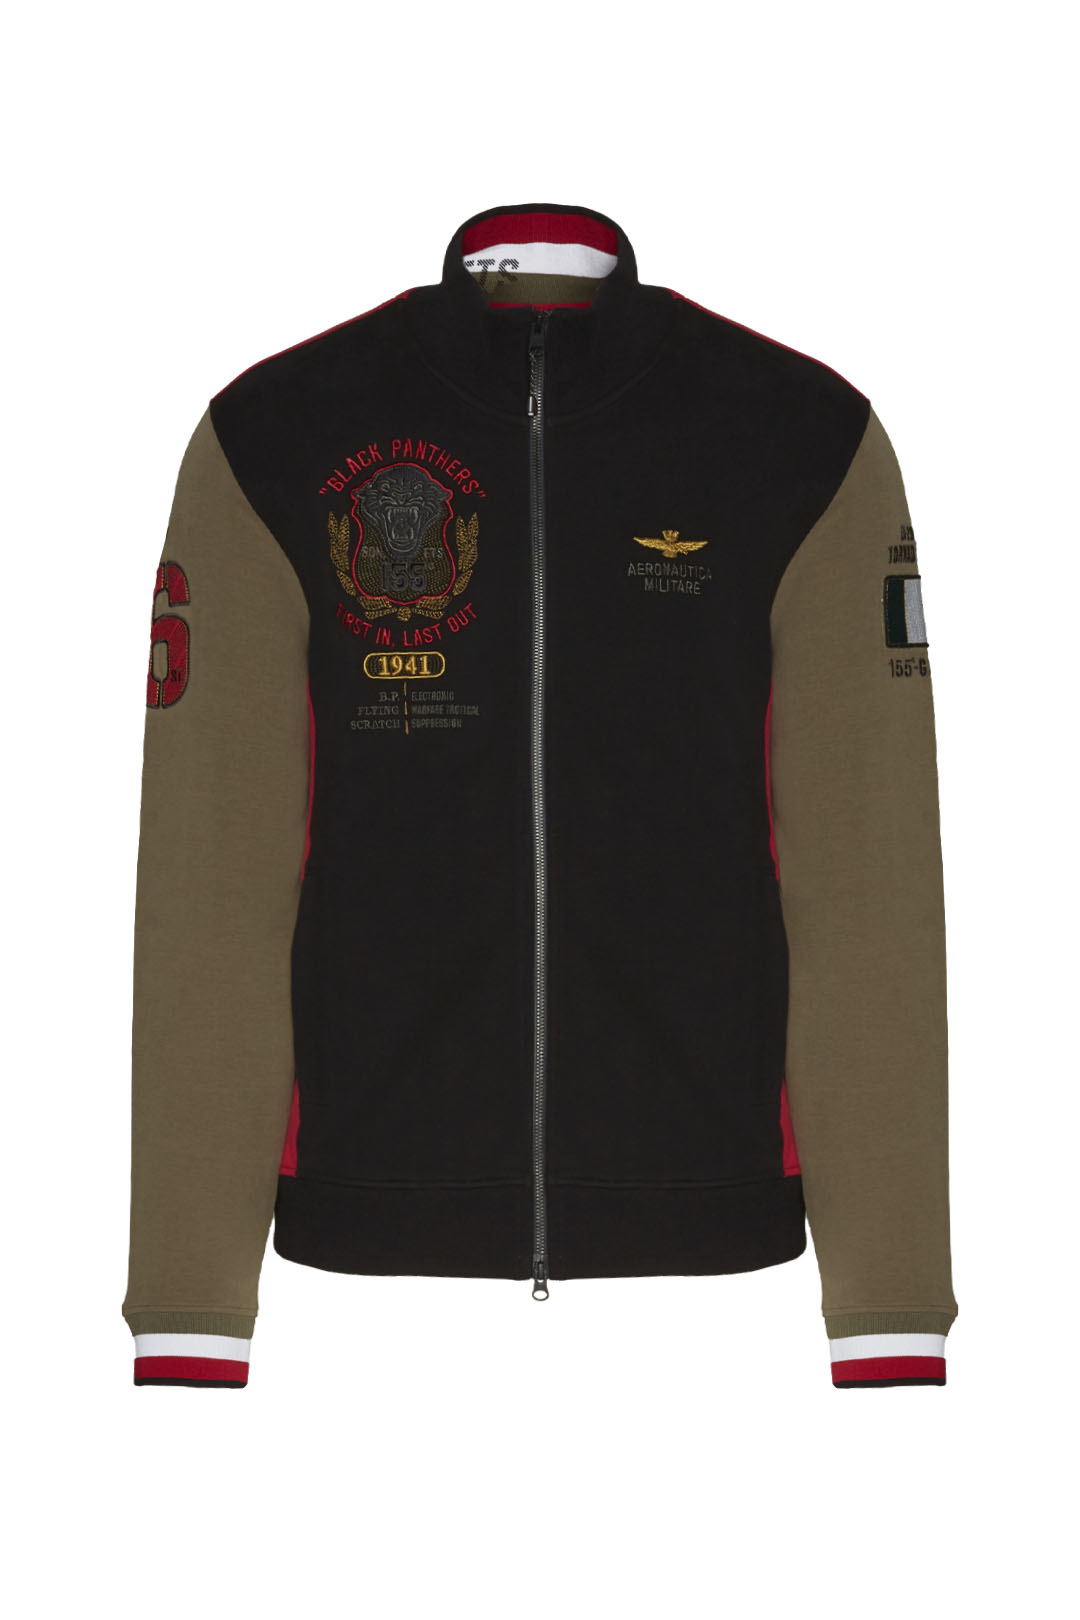 Sweatshirt 155° Gruppo Pantere Nere      1